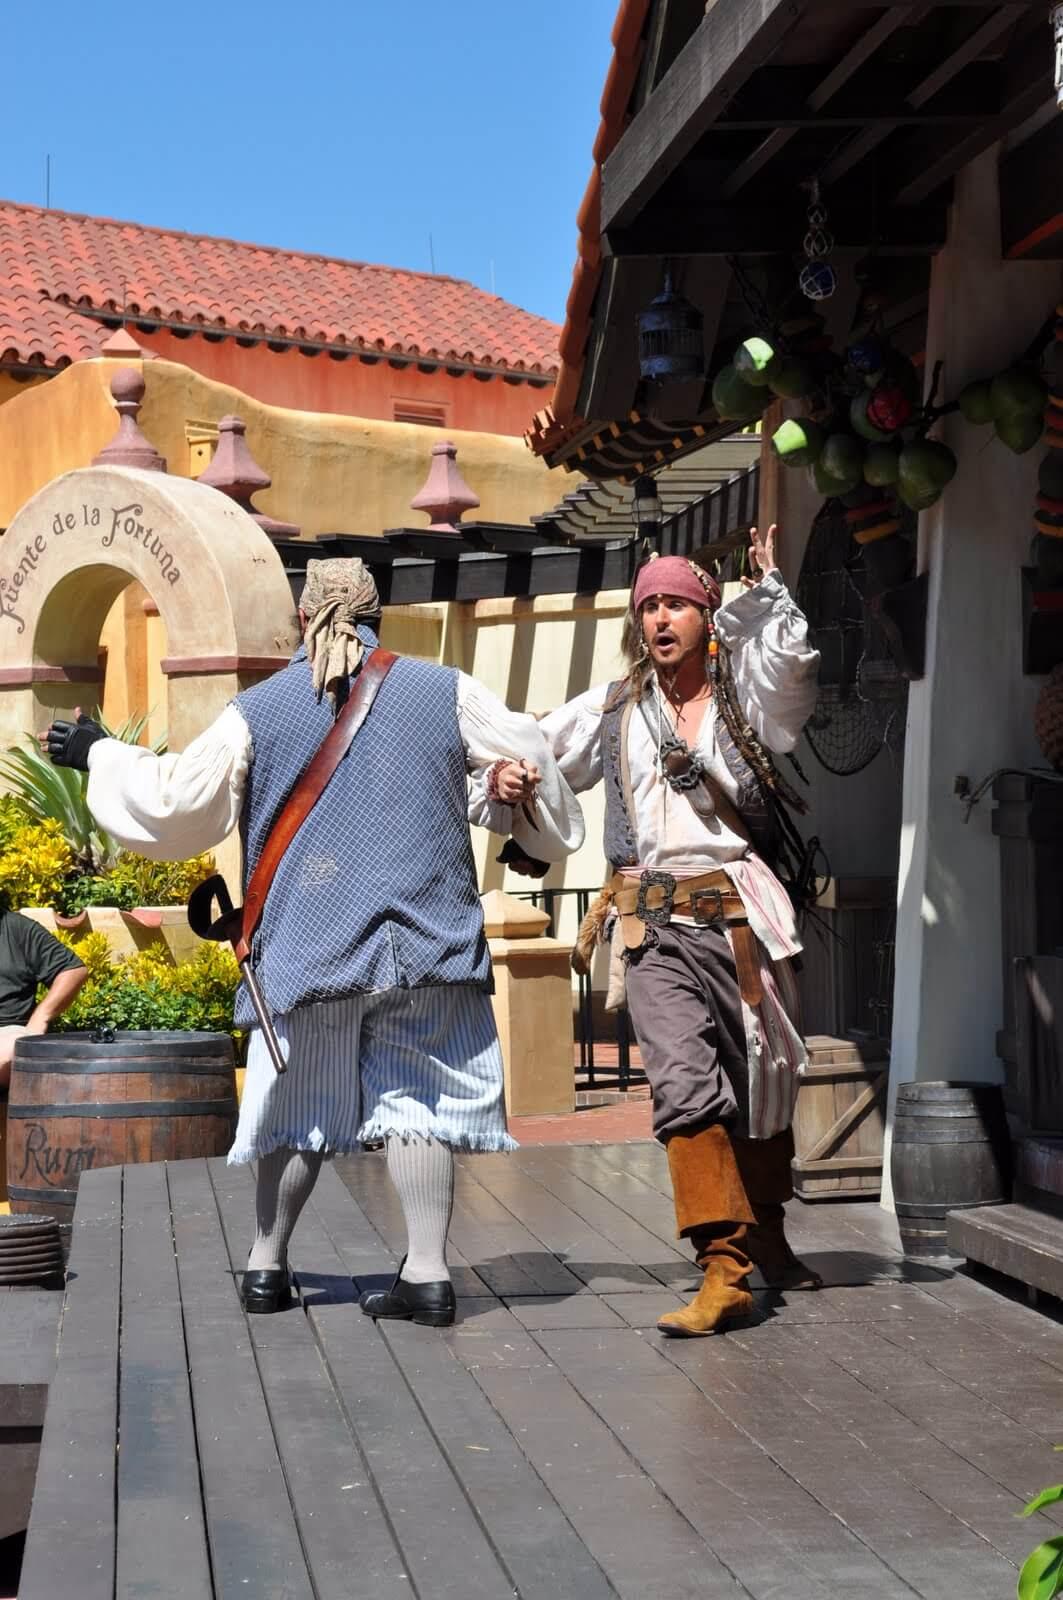 Planning A Birthday Celebration At Walt Disney World